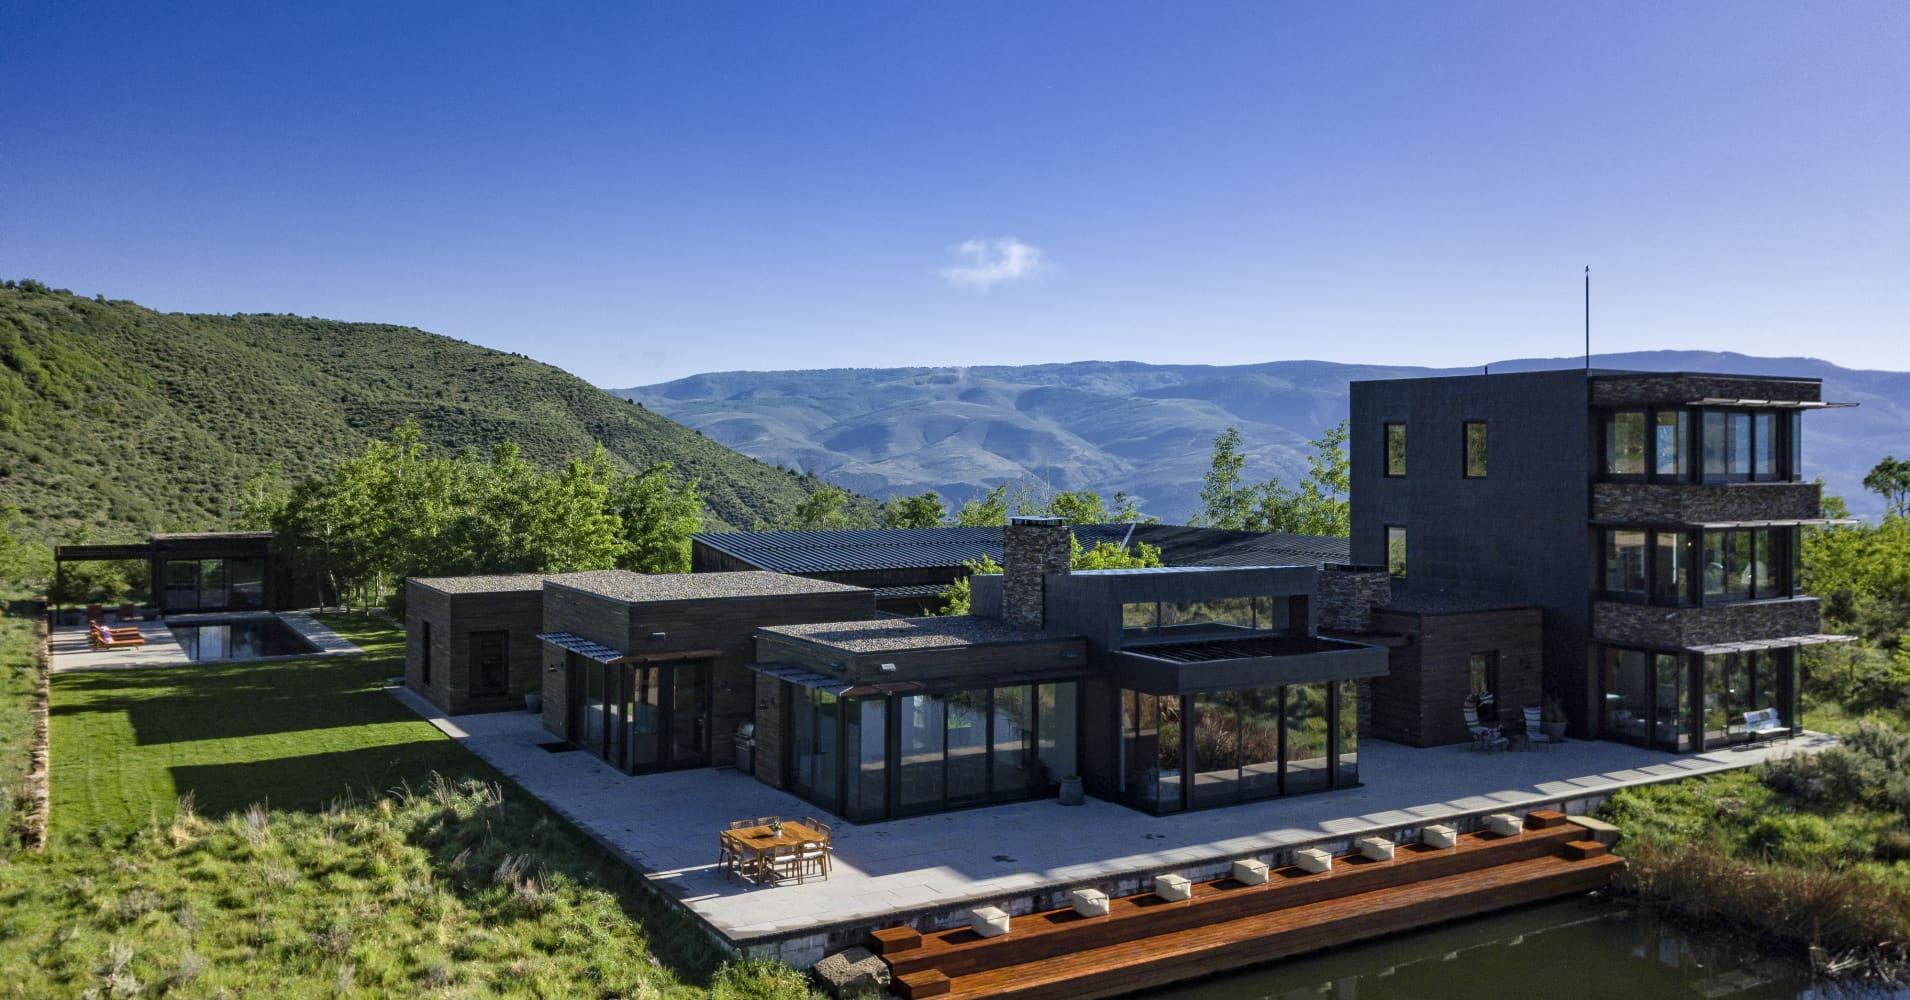 The $29 million Walden House